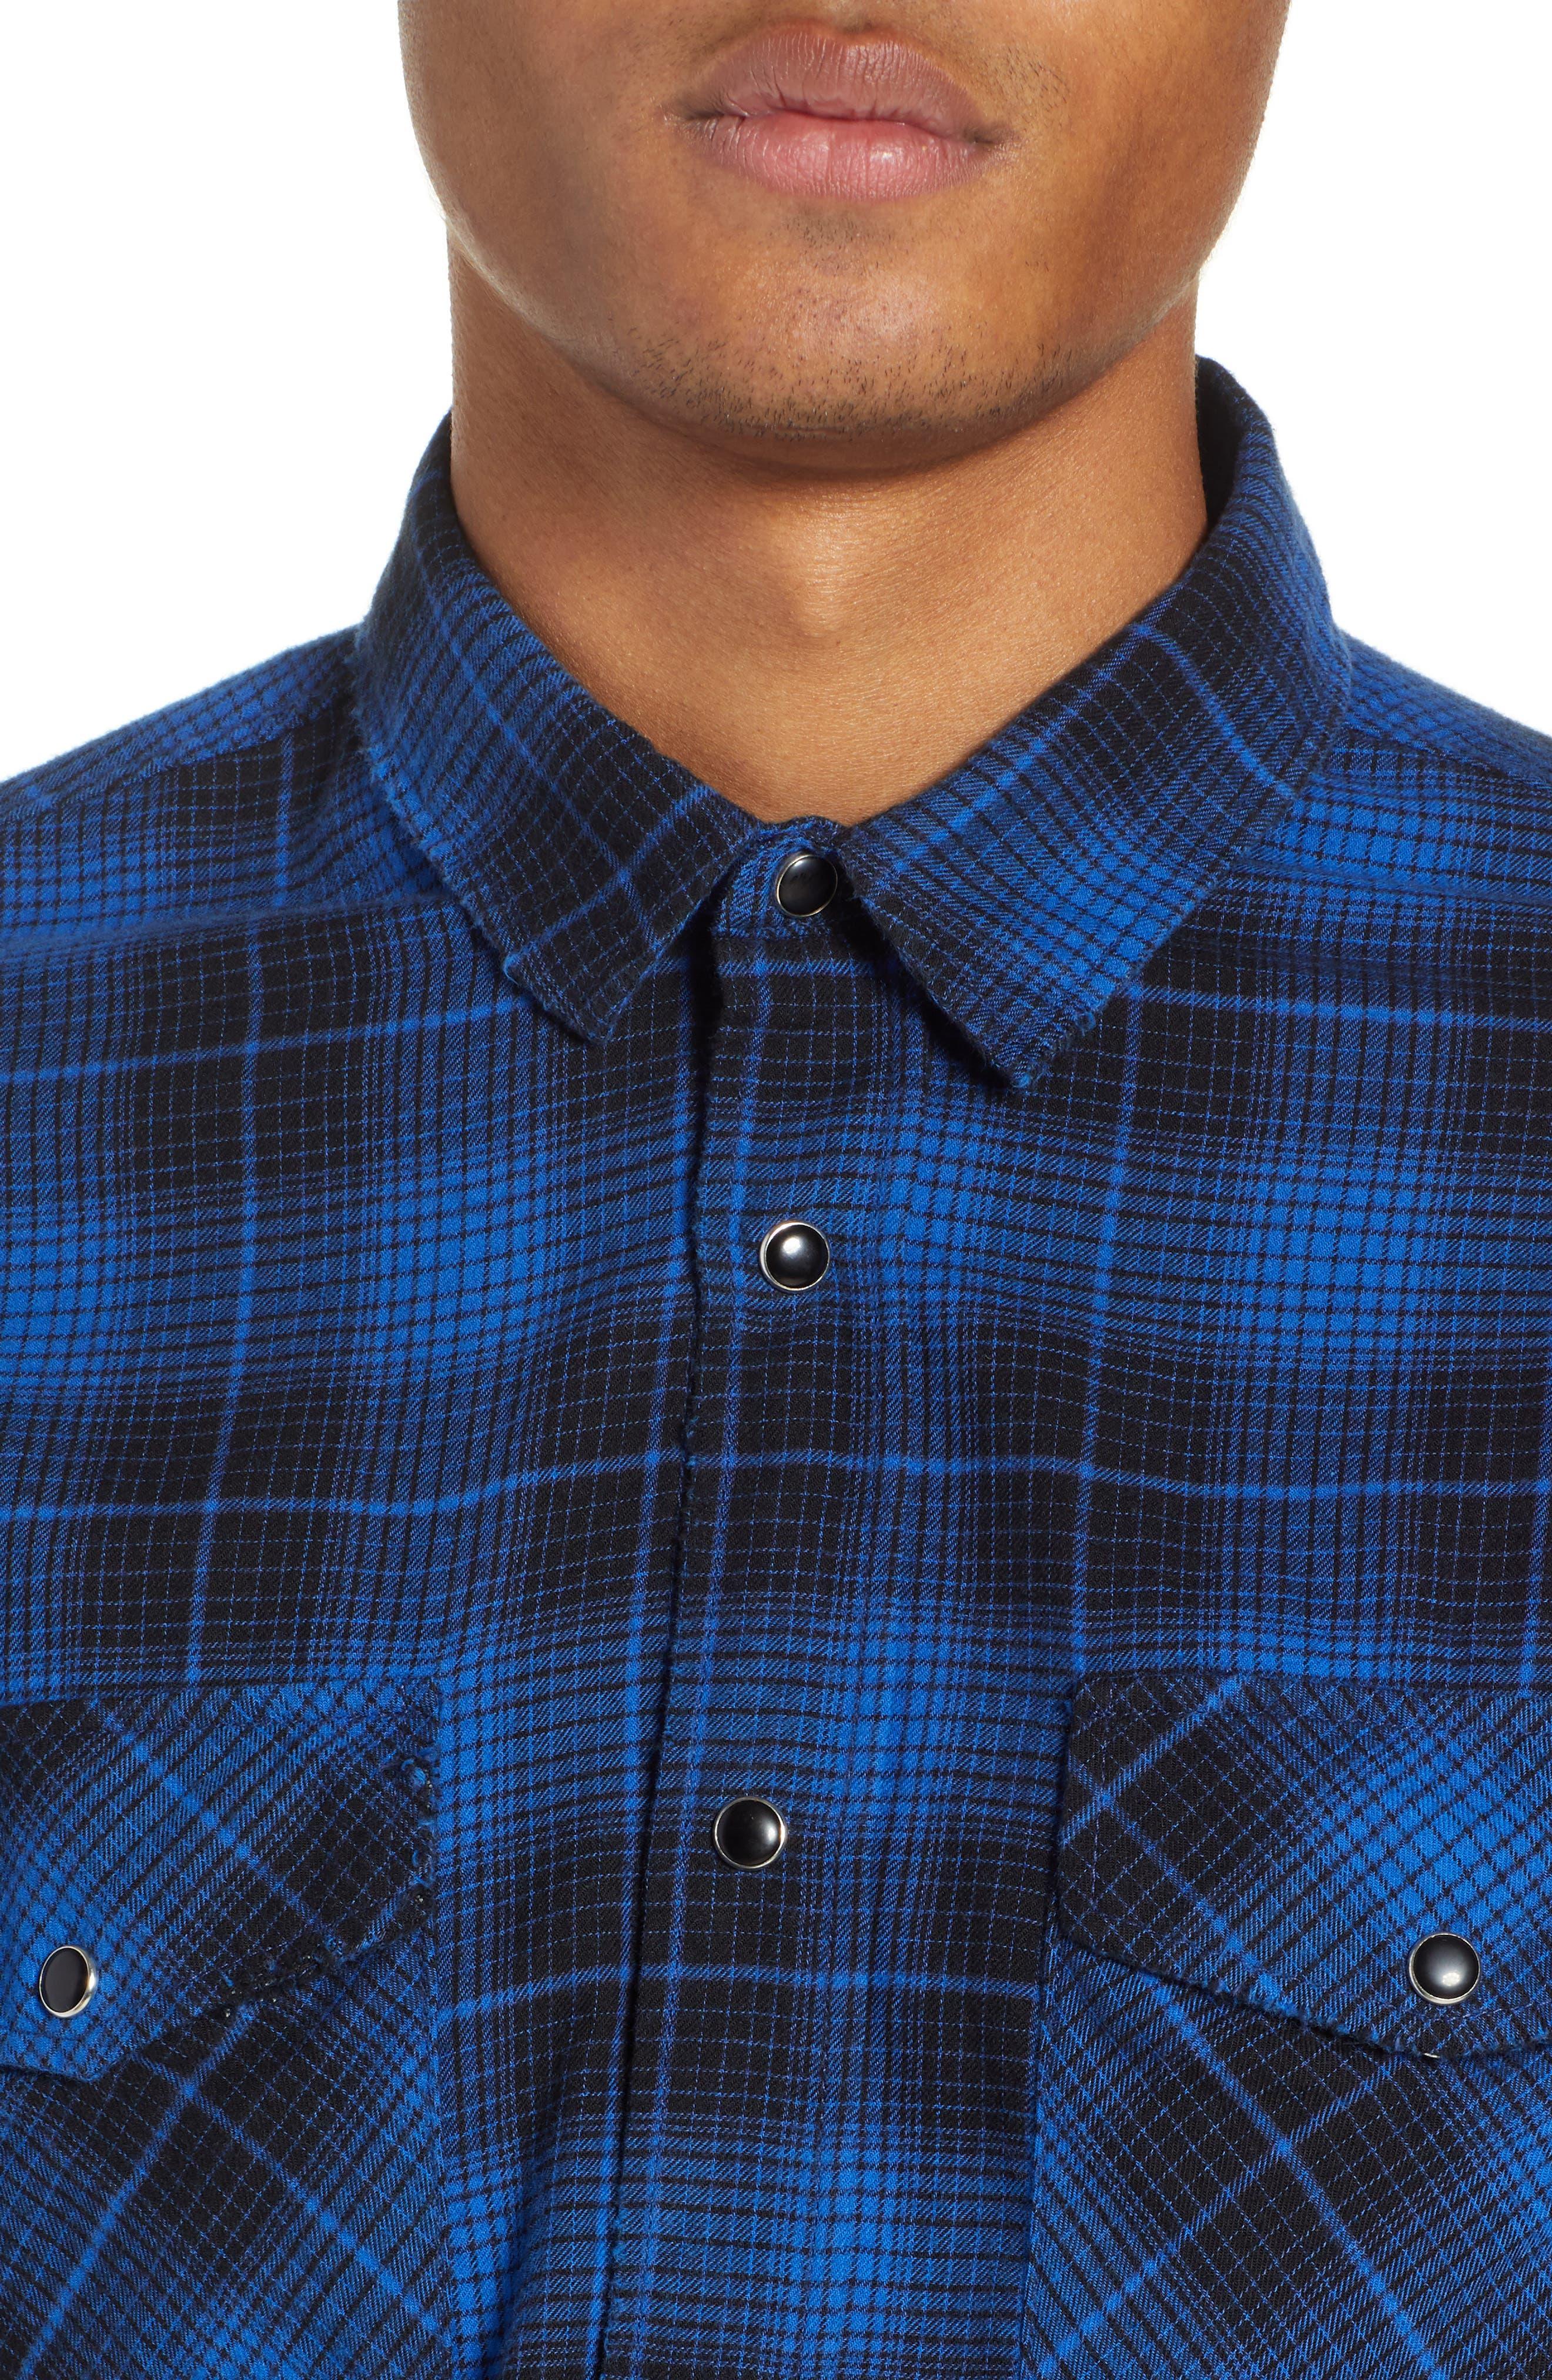 THE KOOPLES, Plaid Flannel Shirt, Alternate thumbnail 2, color, 400